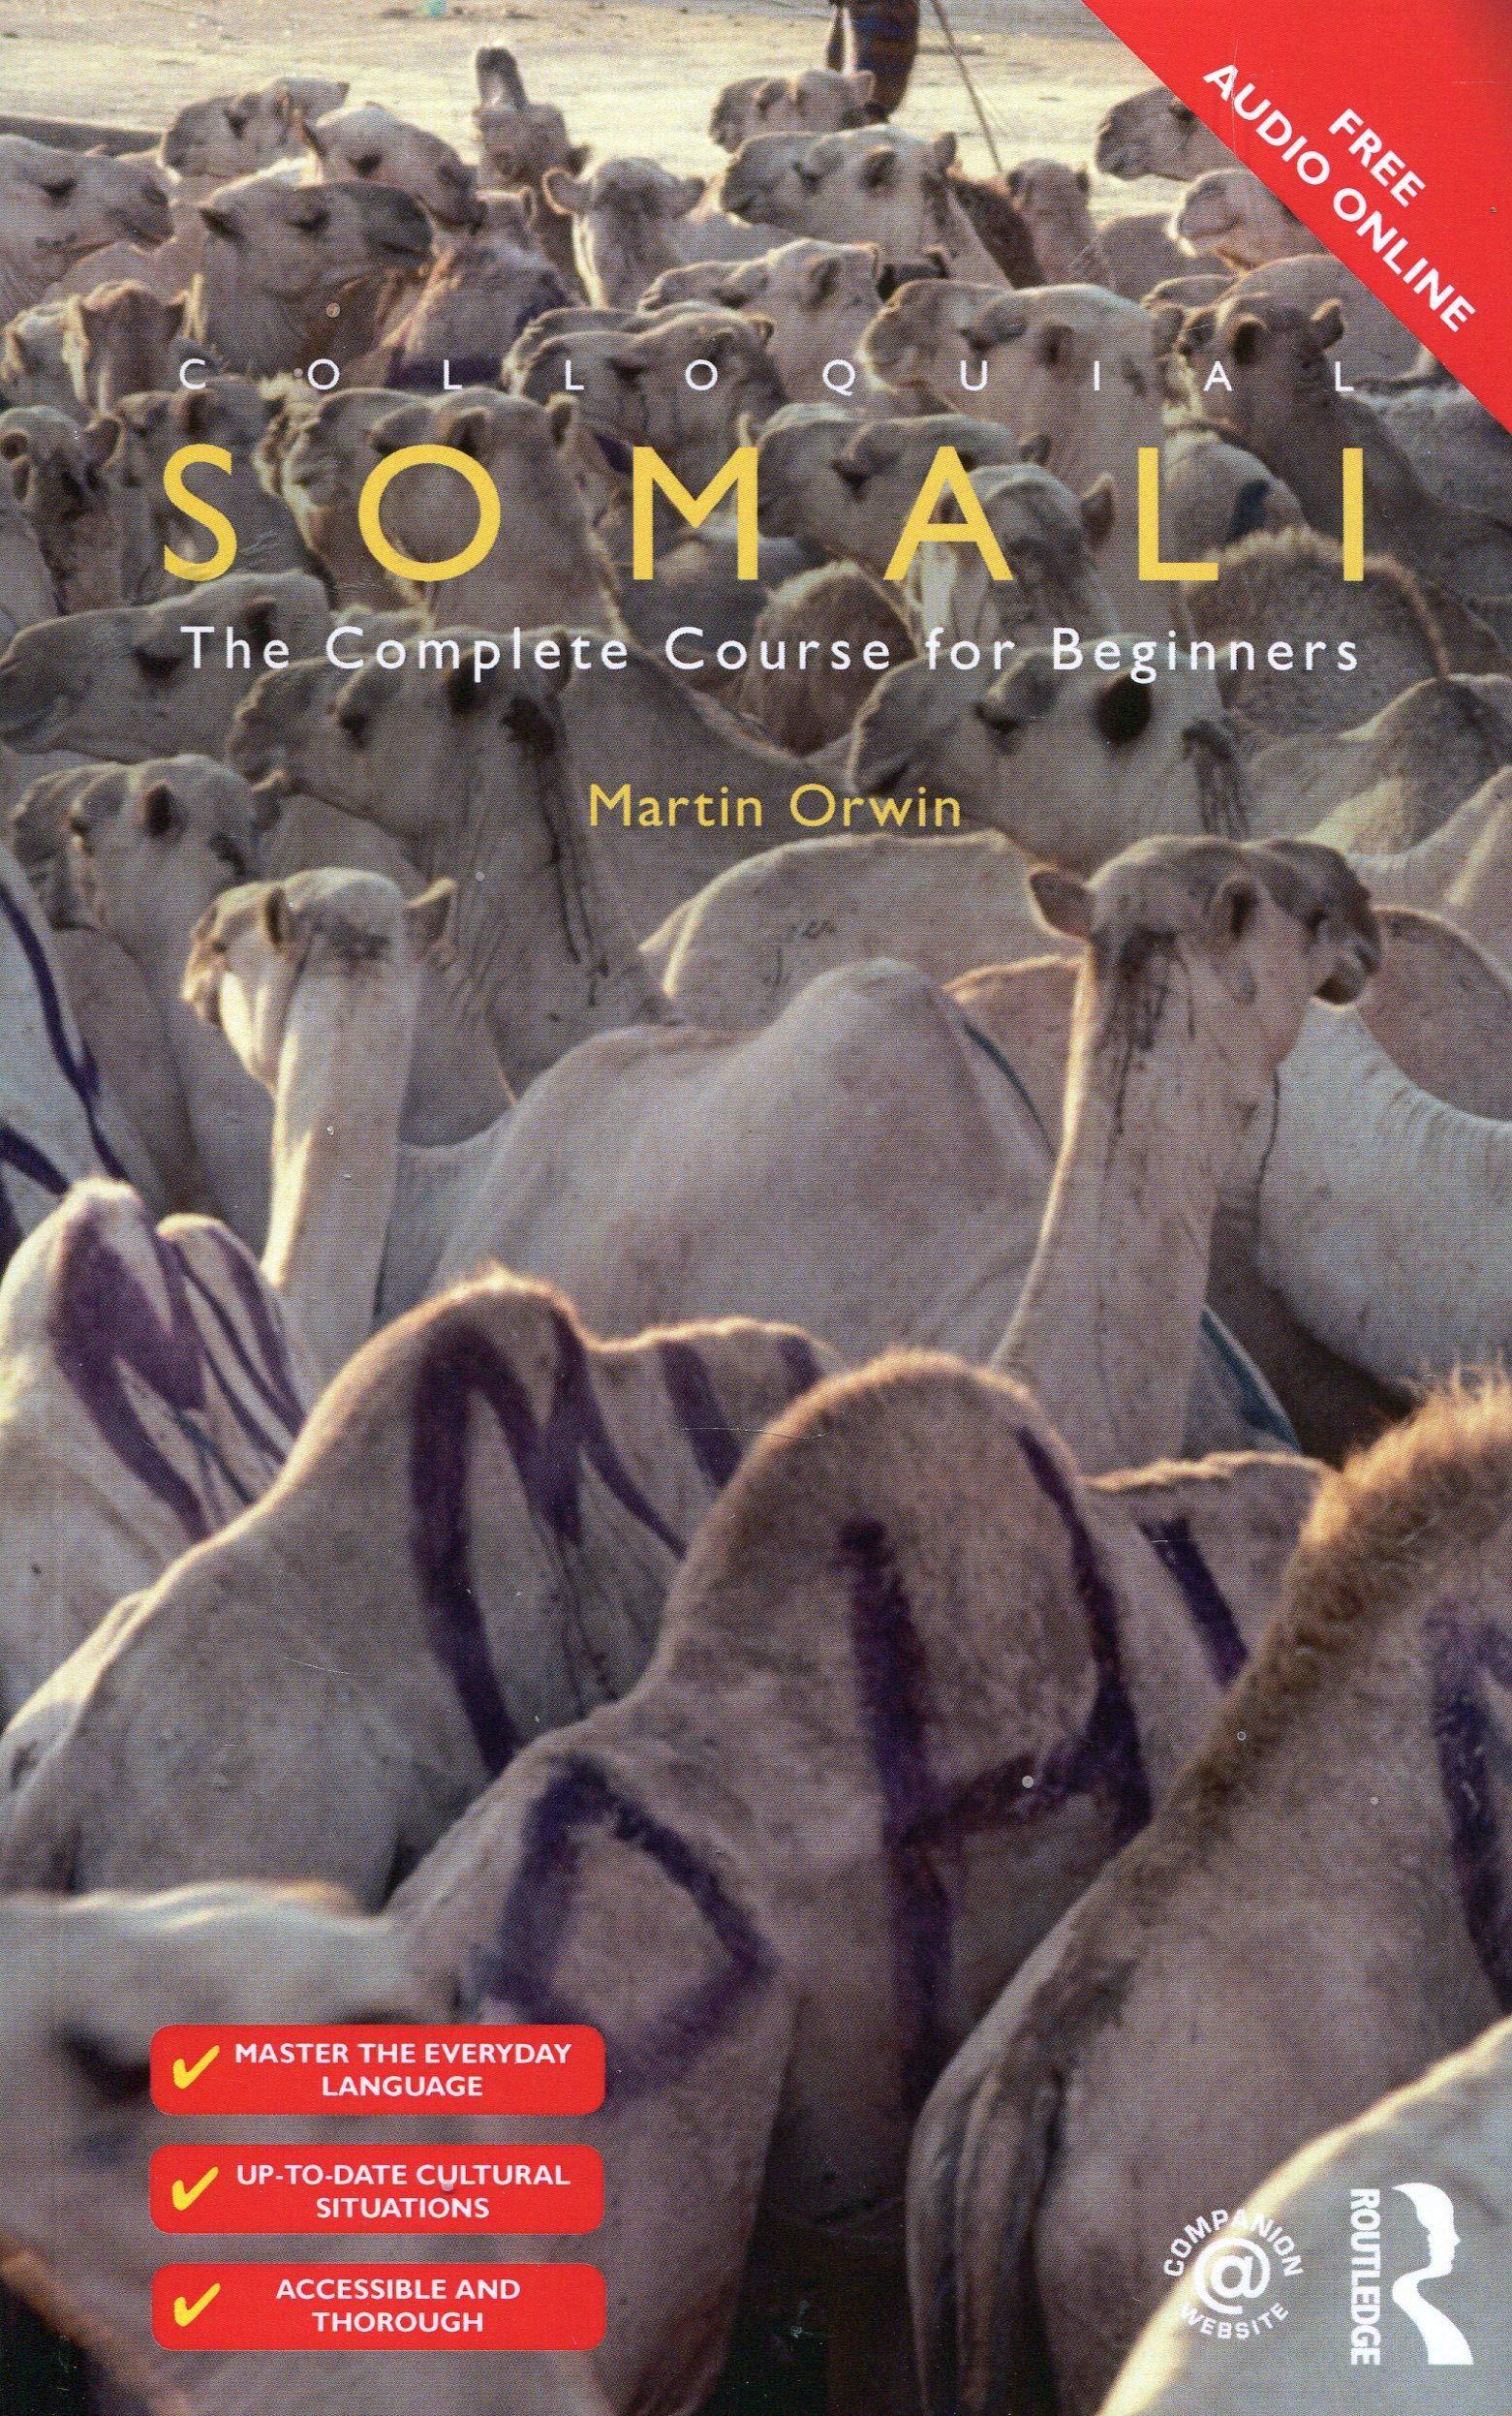 Somaliland Dating-Seiten Beste Online-Dating-Website adelaide